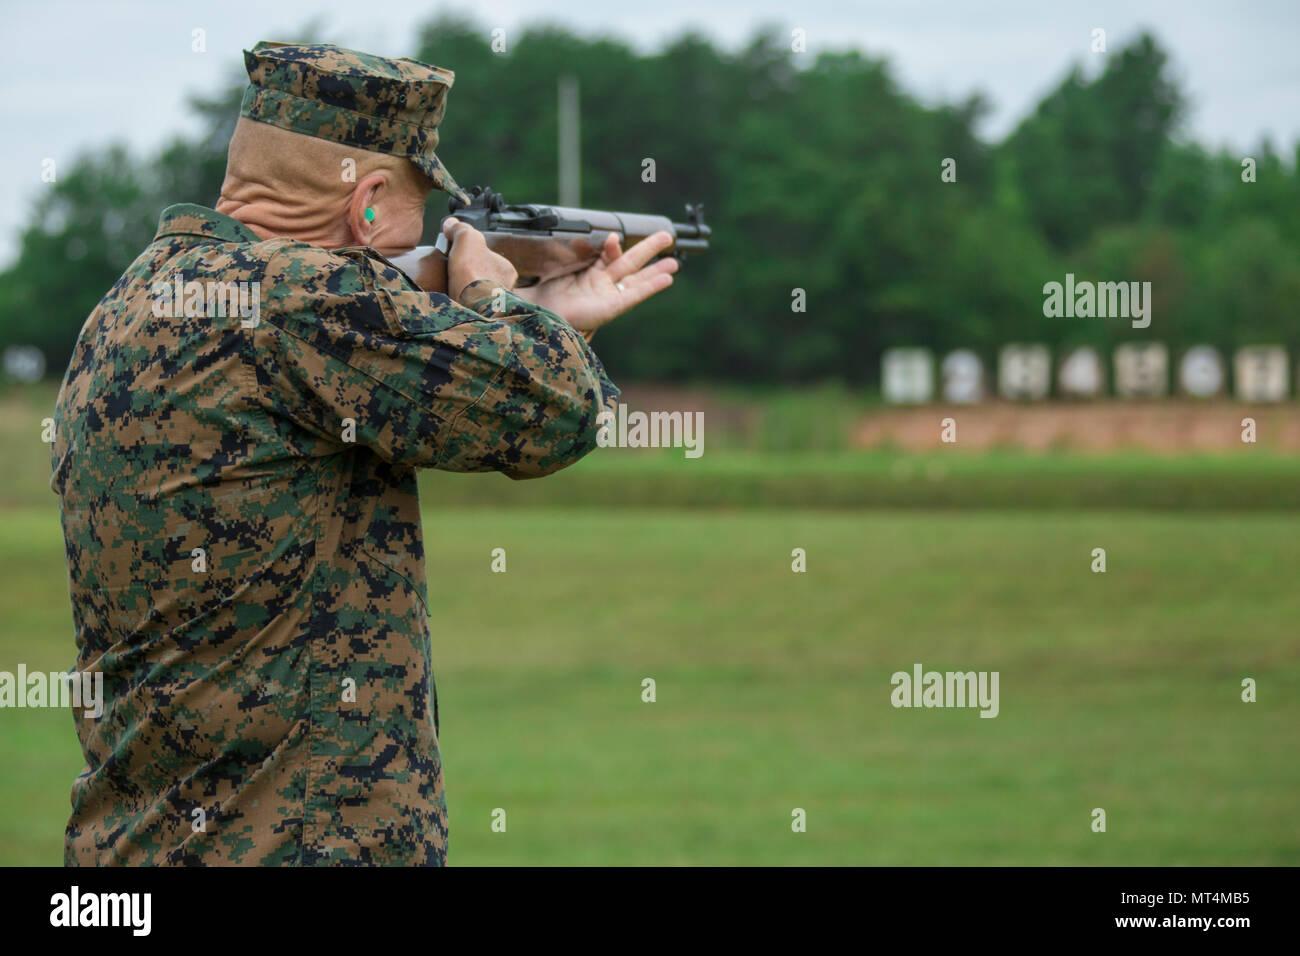 d26359b404f M1 Rifle Stock Photos   M1 Rifle Stock Images - Alamy